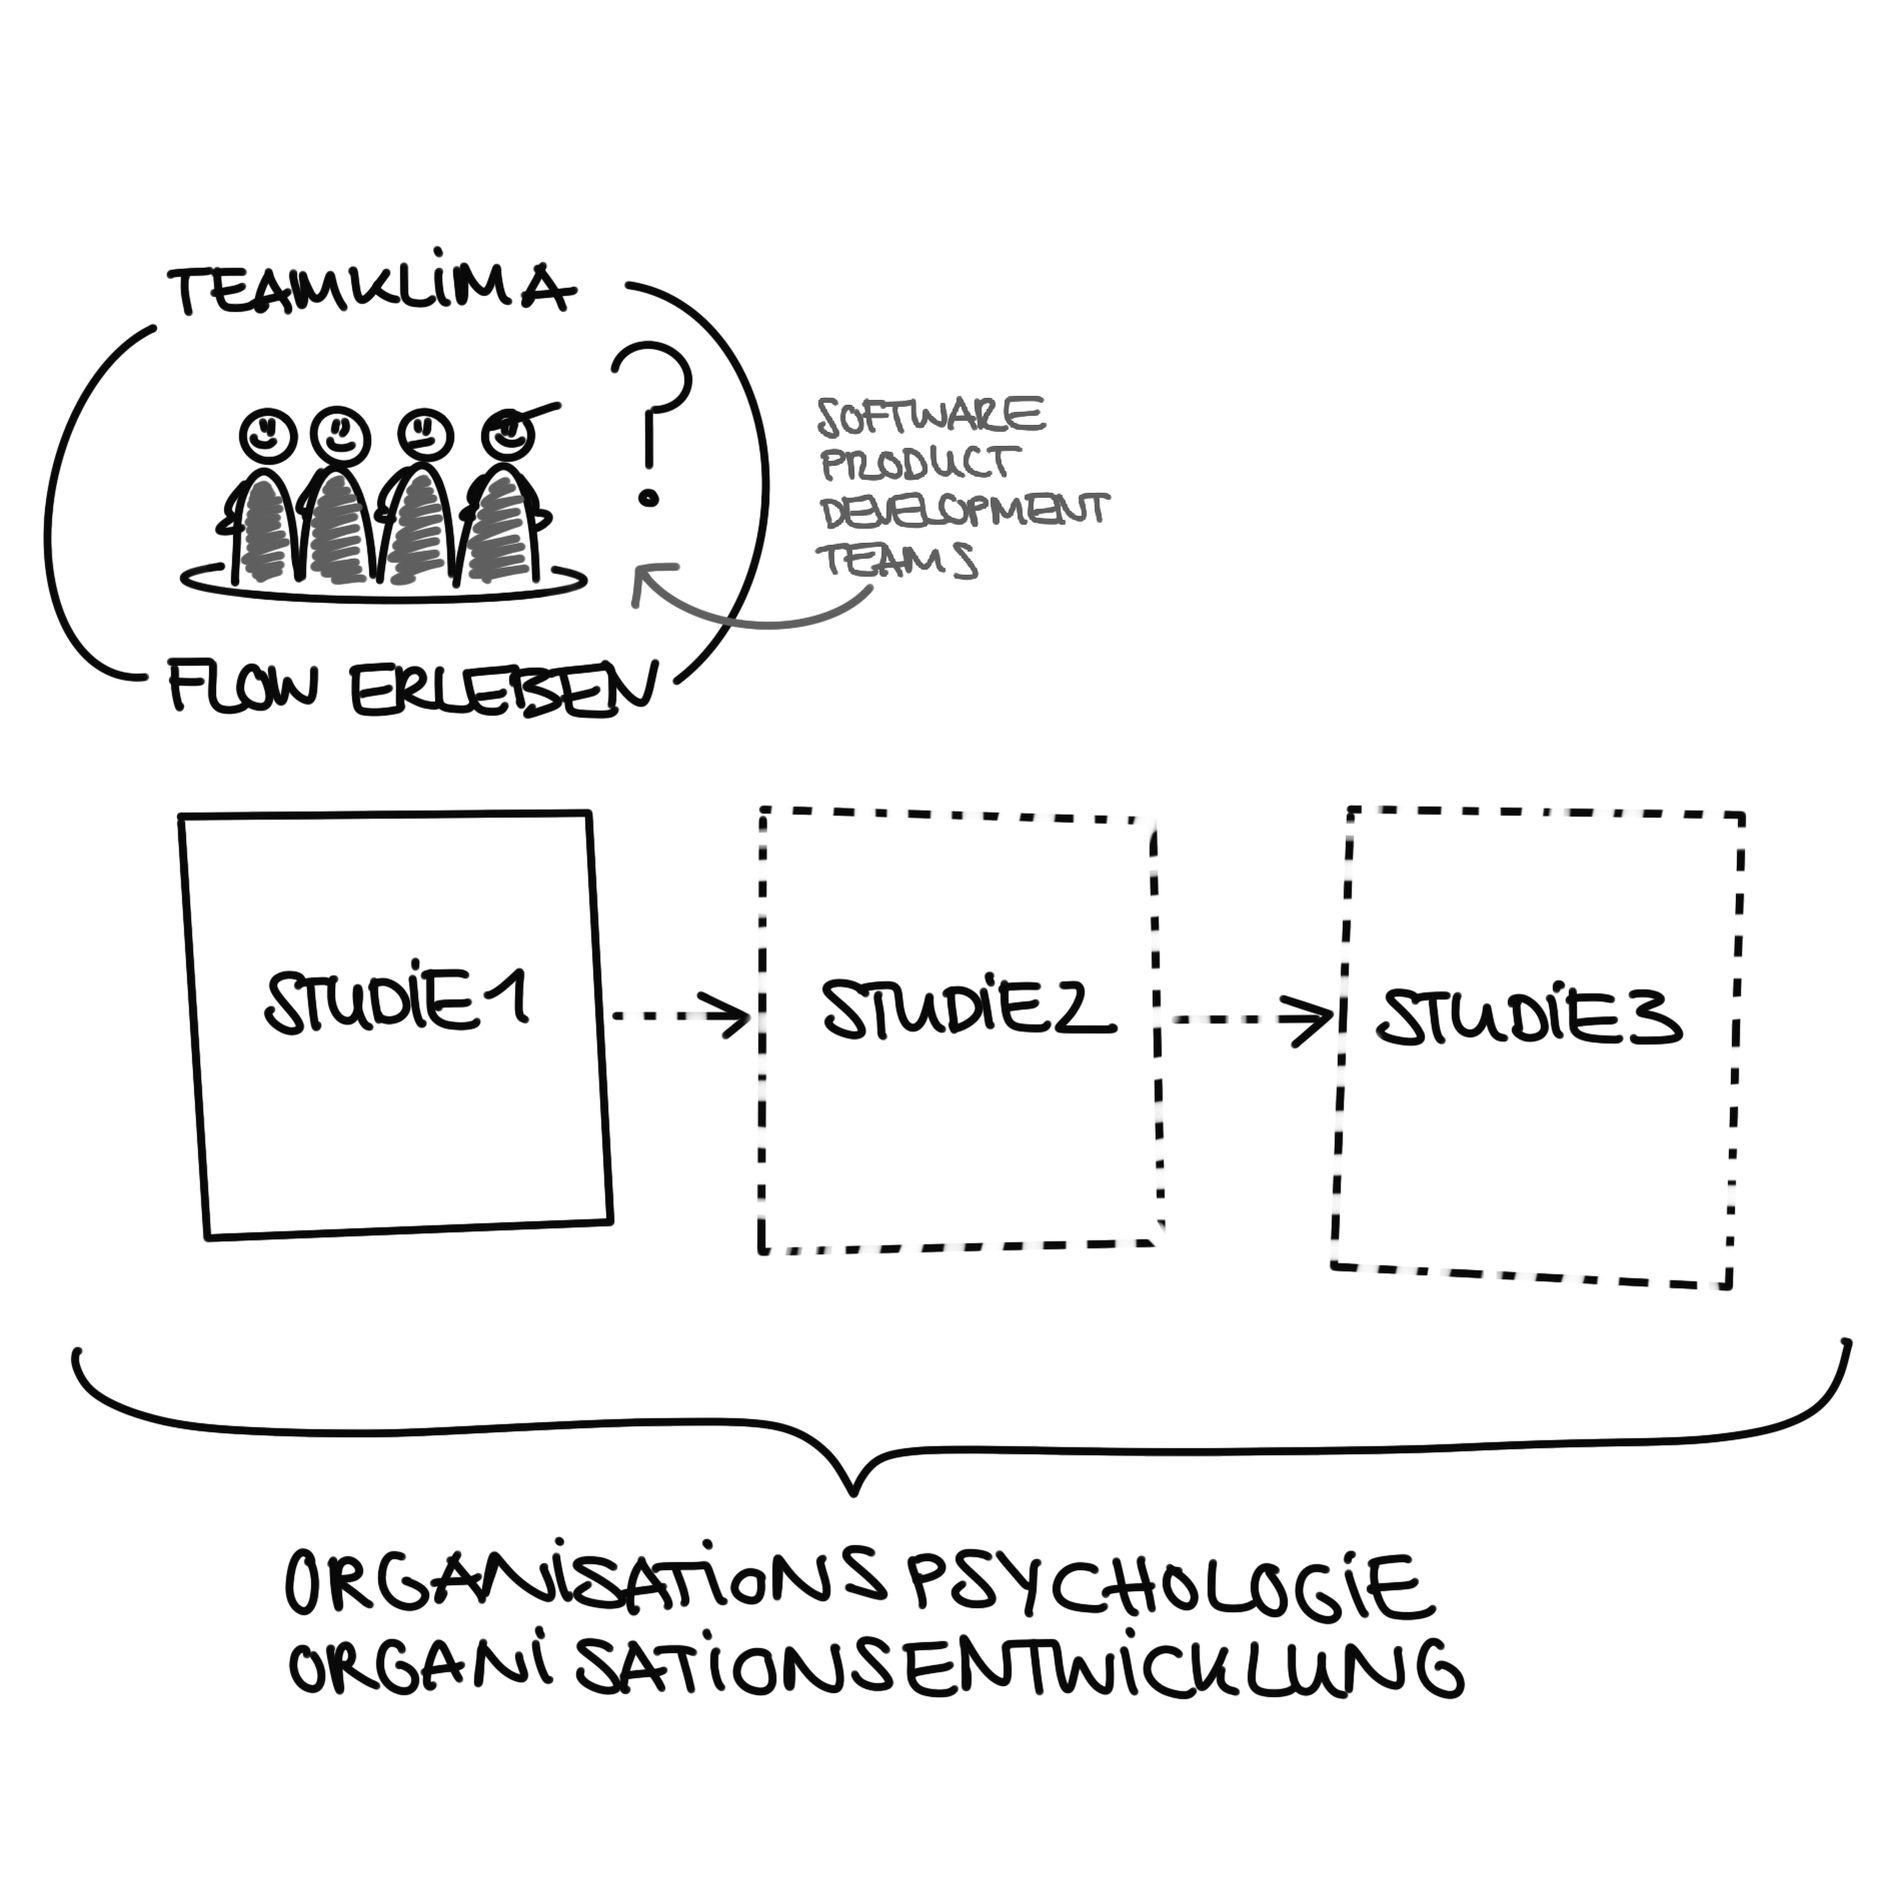 #teamagile Studie 01 - Teamklima & Flow-Erleben